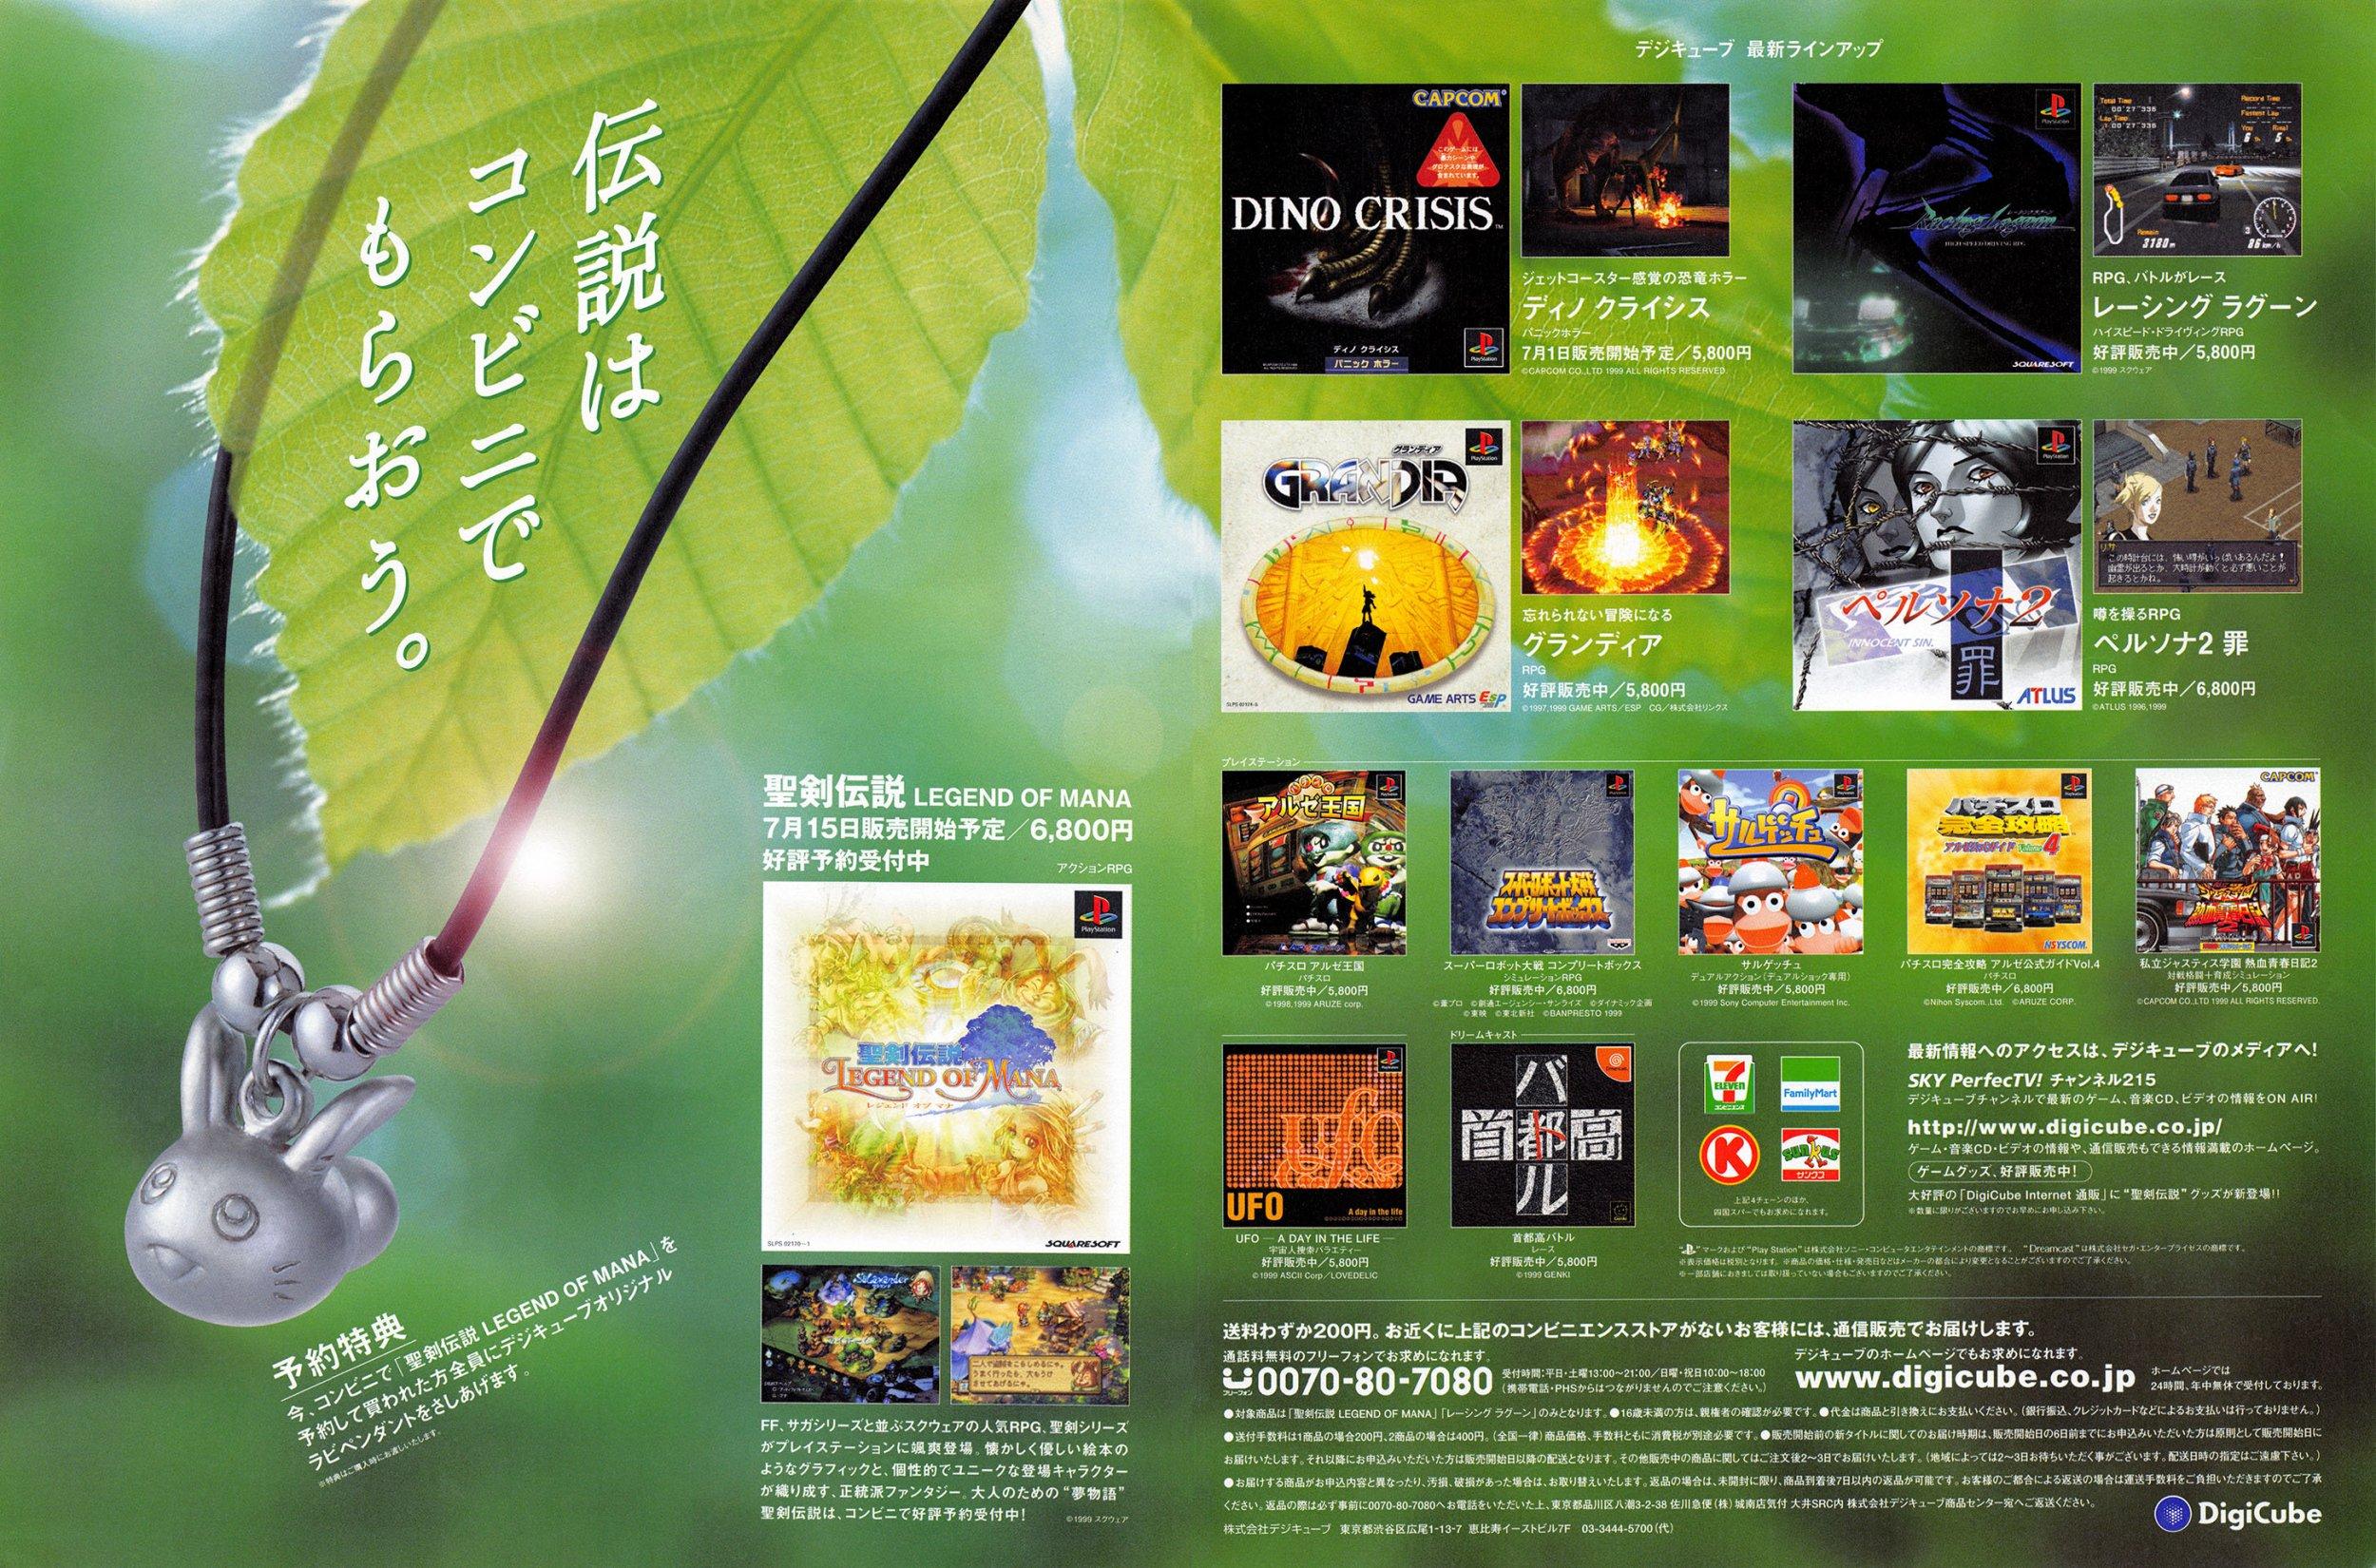 Legend of Mana, Digicube (Japan)